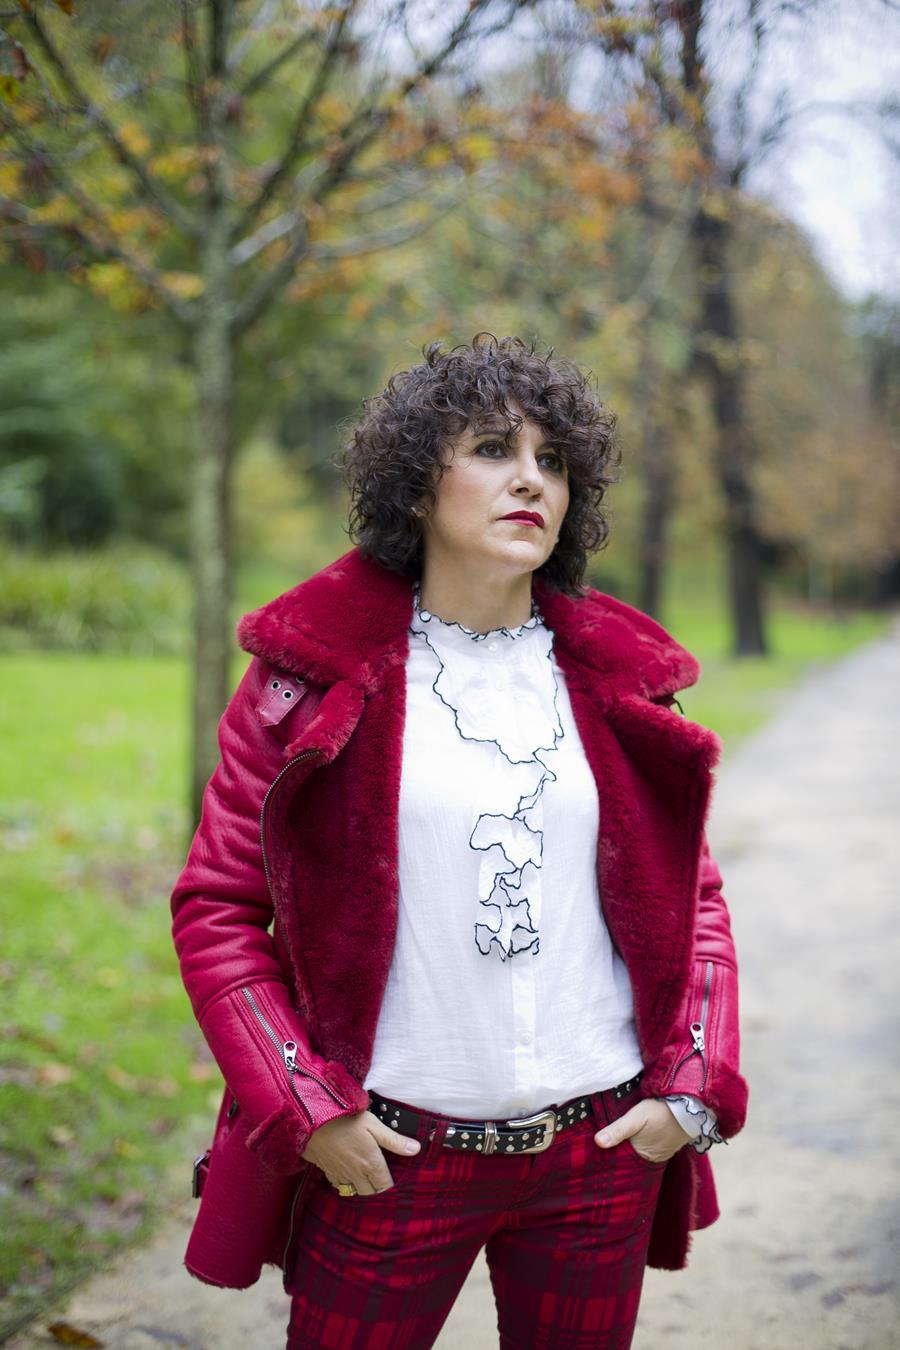 Rebeca Valdivia, asesora de imagen, personal shopper, estilista, stilist, influencer, Donostia, San Sebastián, Miss Clov, la blogger indie, influencer, tartán, pantalón pitillo, pantalón de cuadros, whiteskirt, frills, red coat, abrigo doble faz, curls, rizos